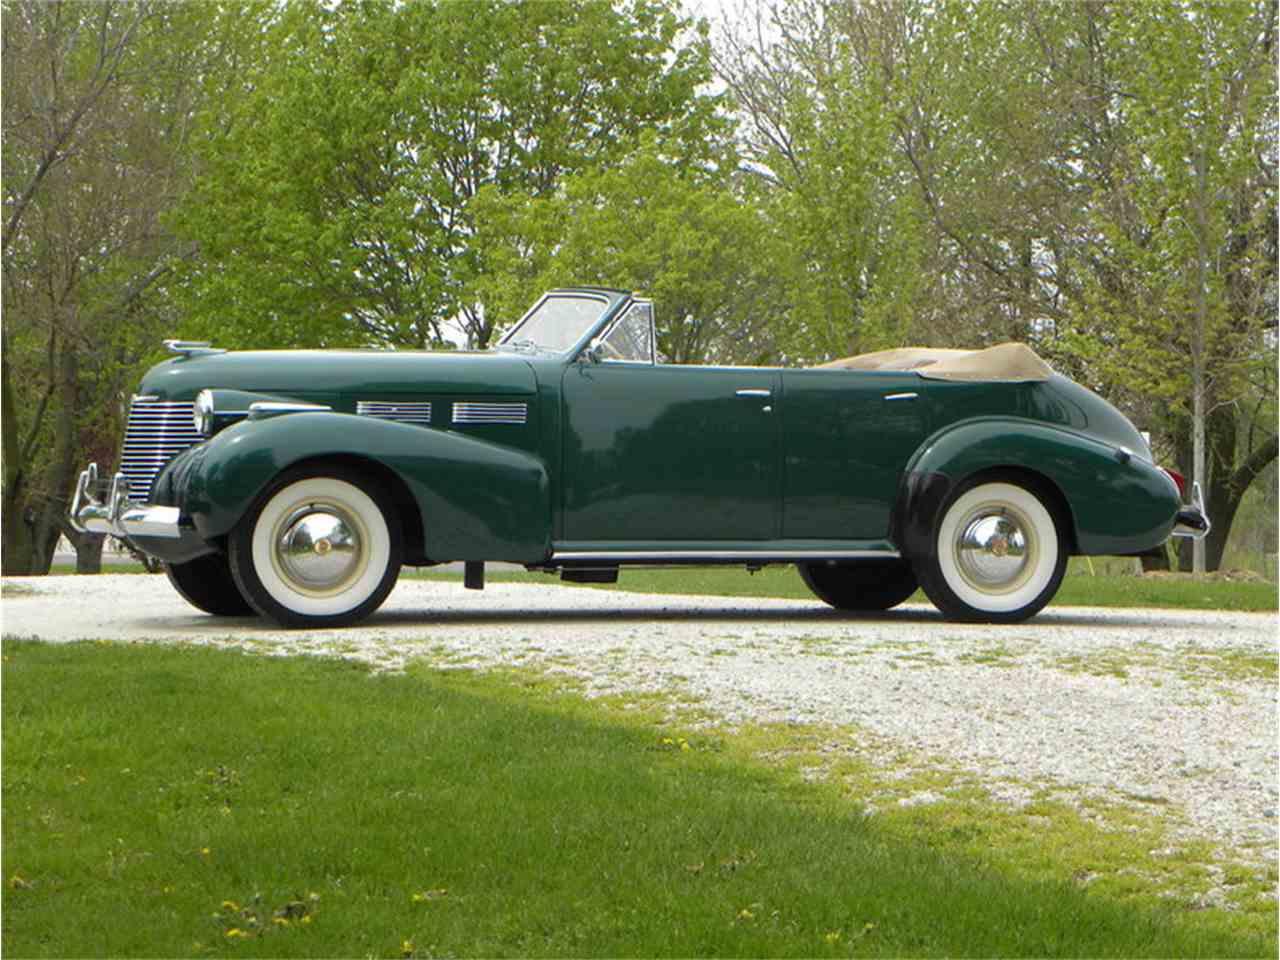 1940 Cadillac Series 62 Convertible Sedan for Sale - CC-981891